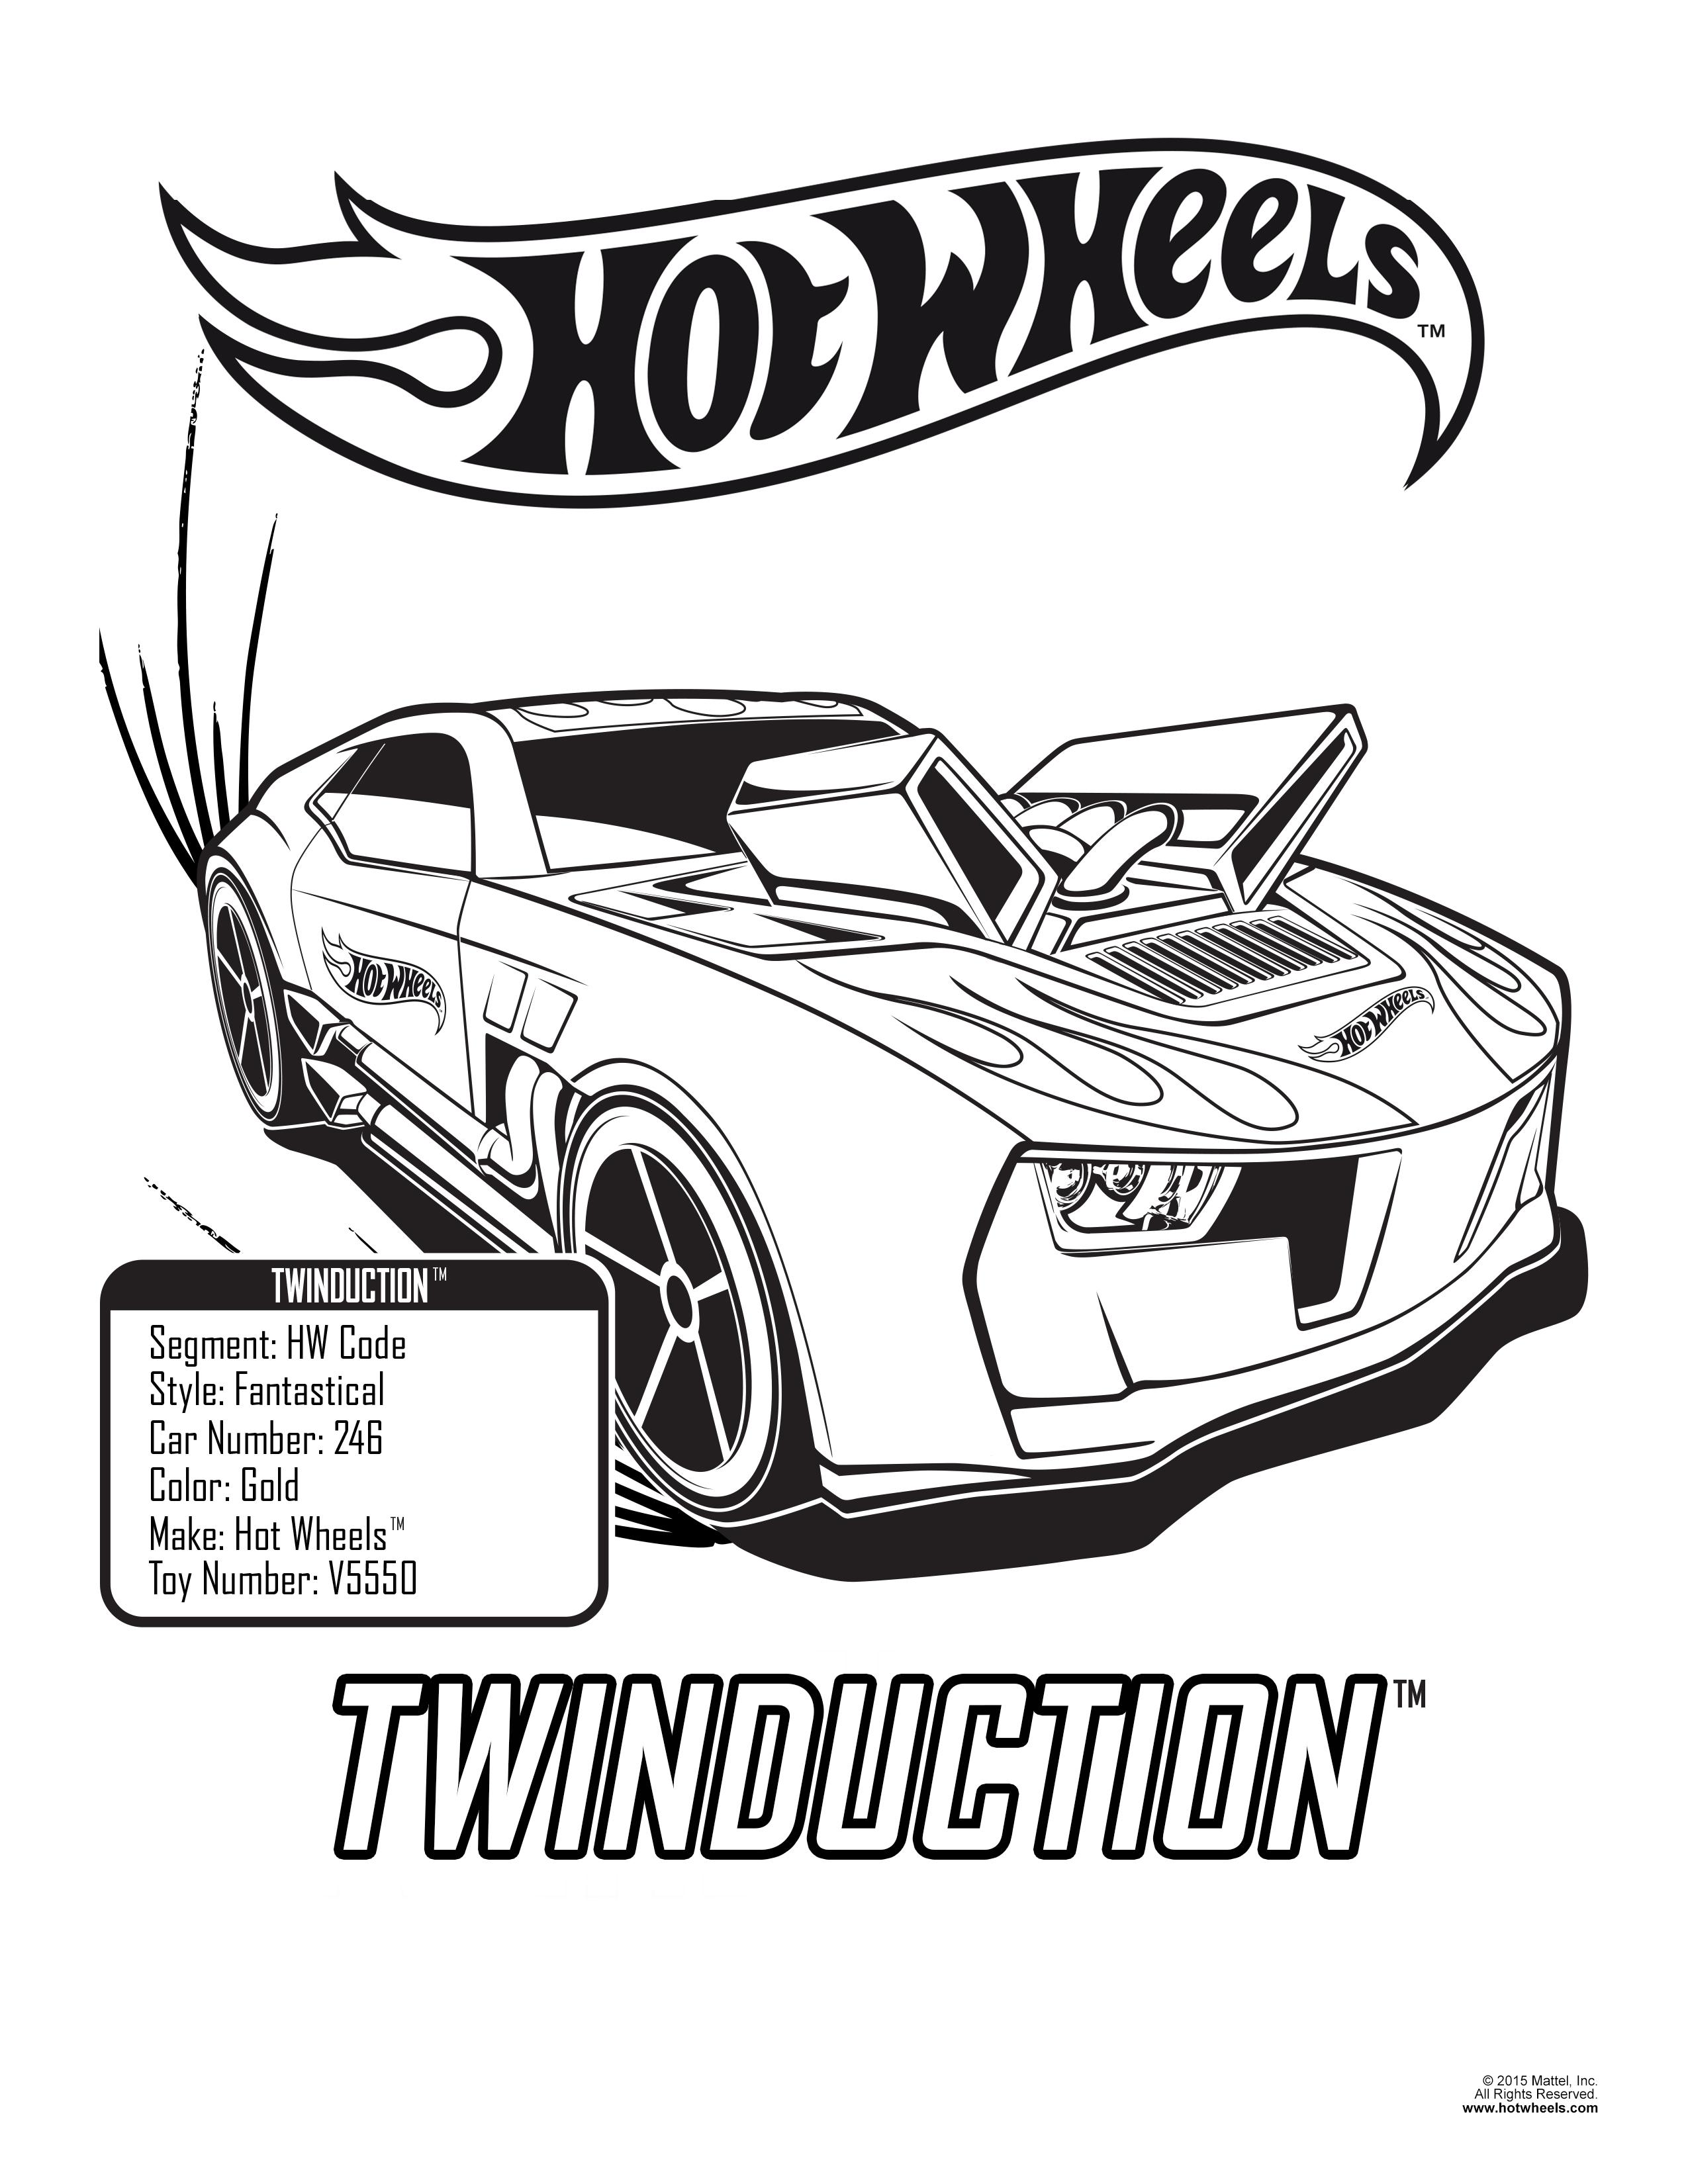 2550x3300 Summertime Play Date Hot Wheels Style! Hot Wheels News Blog